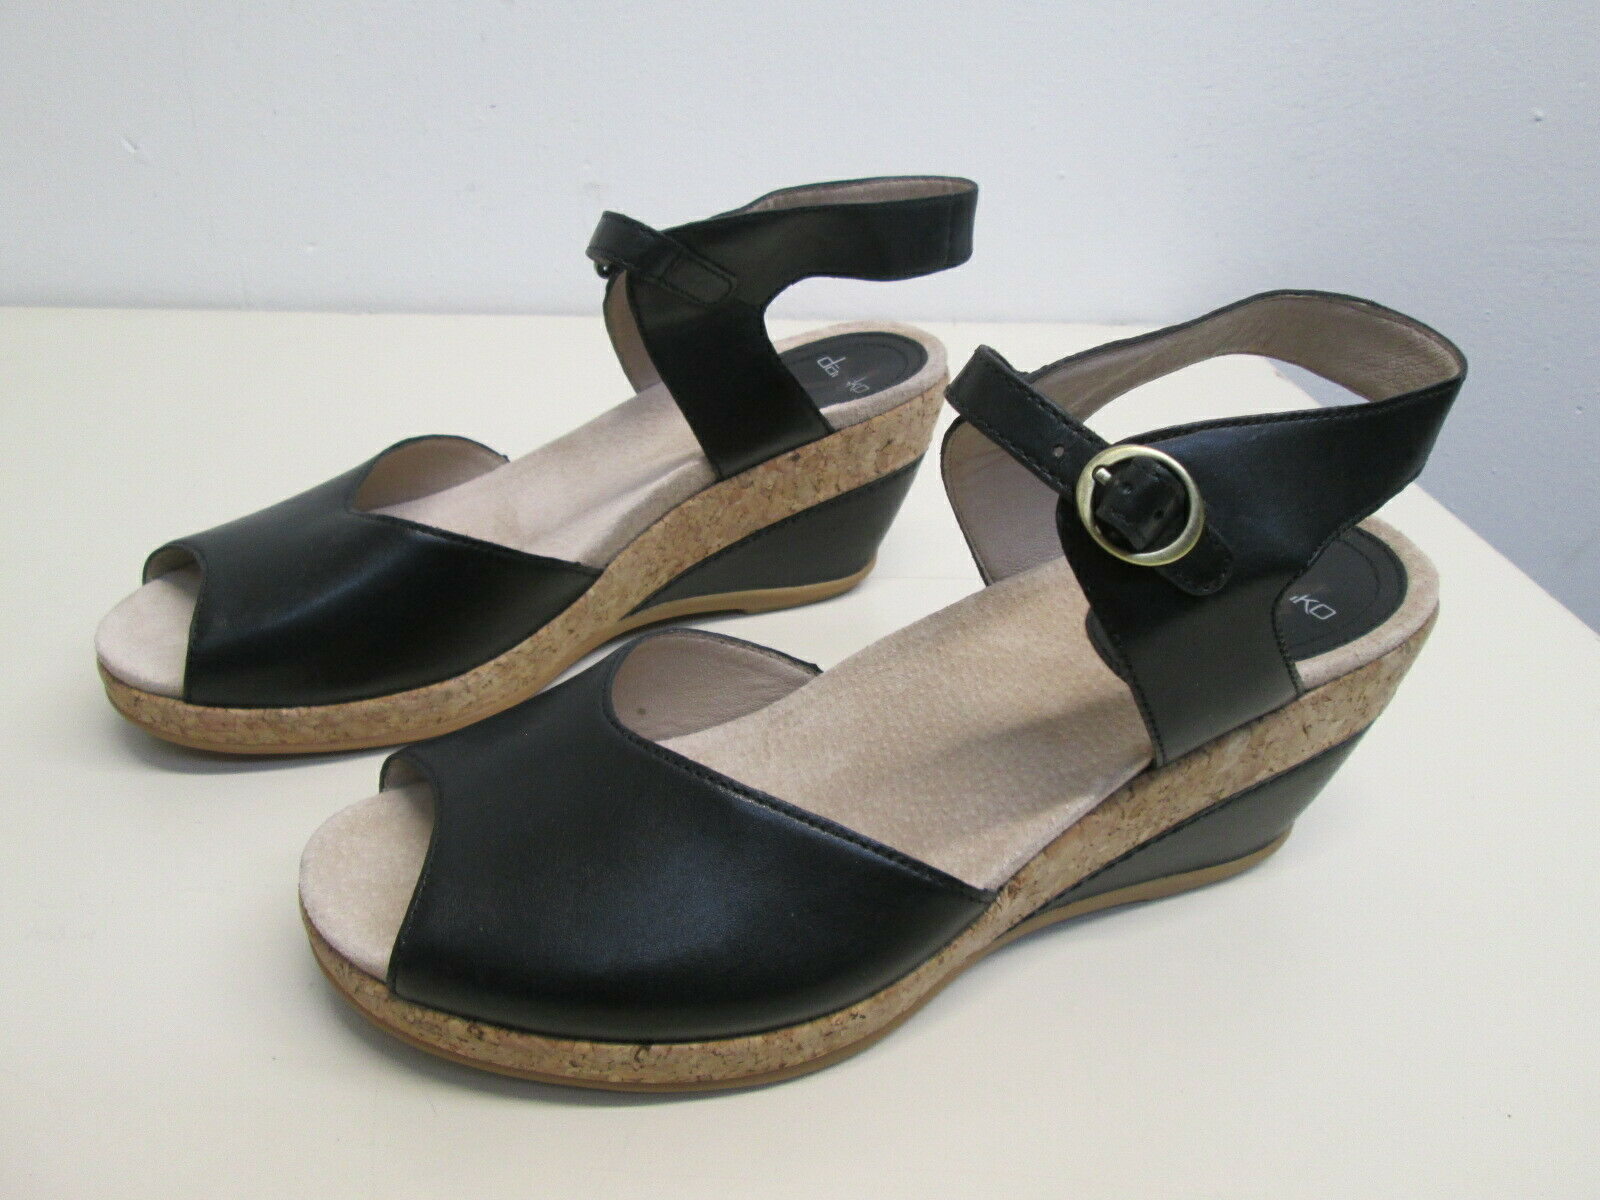 New Dansko Charlotte Black Leather Sandal Wedge open toe heel size 42 EU 11.5 US